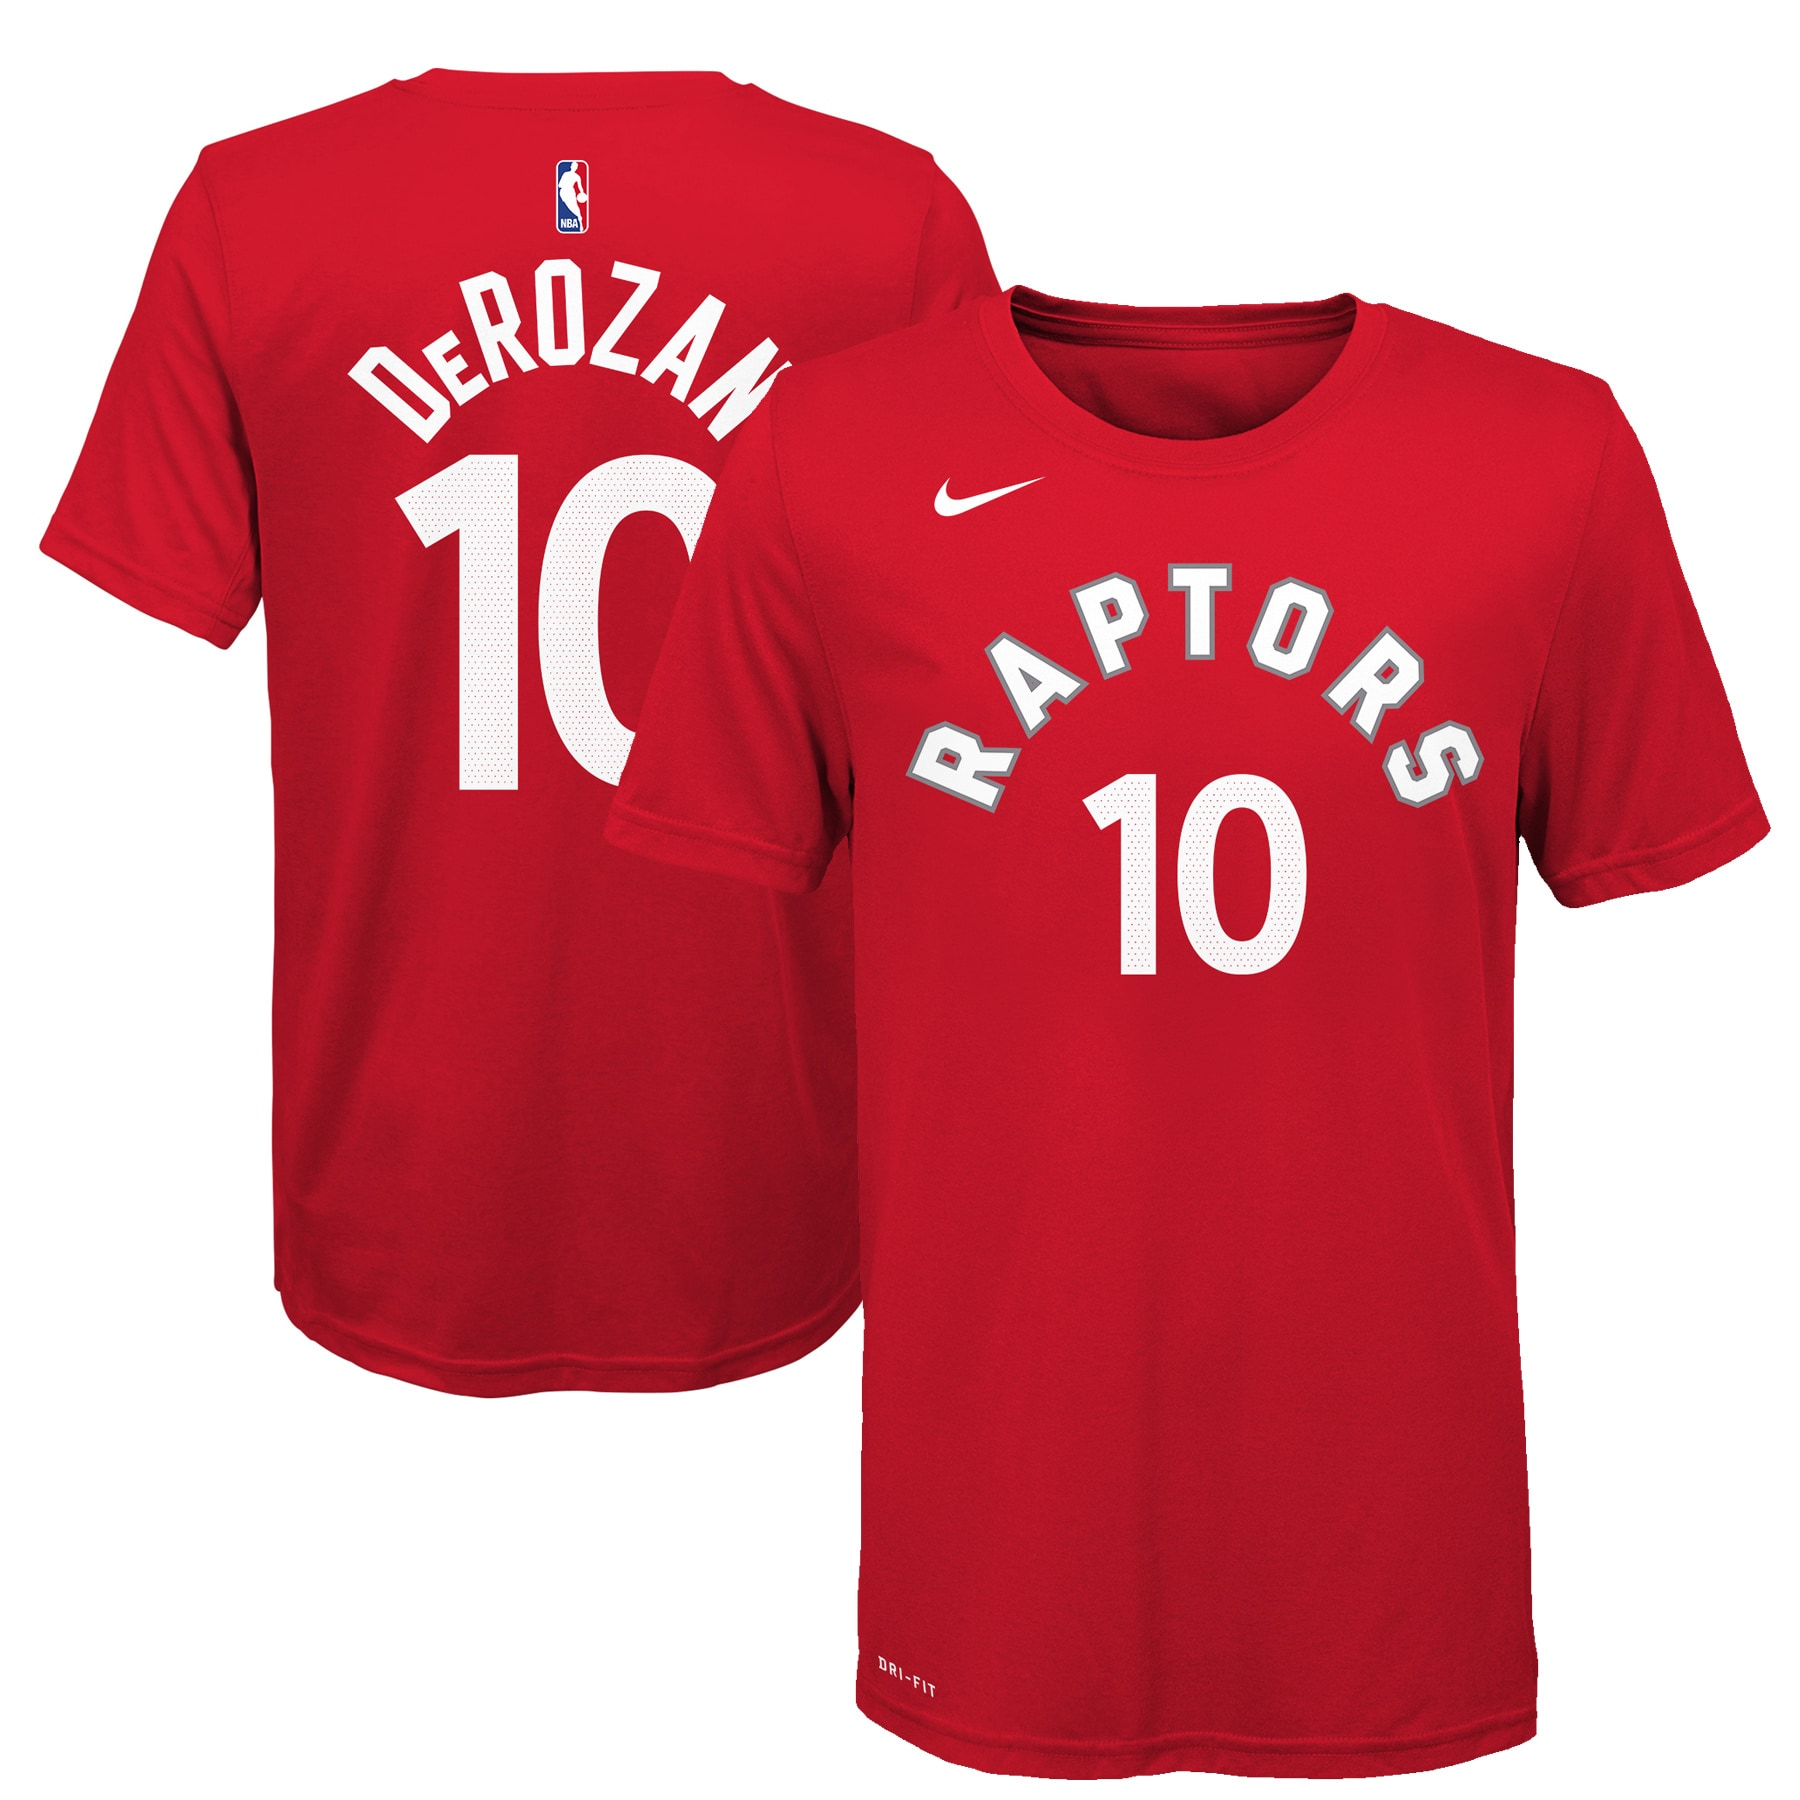 DeMar DeRozan Toronto Raptors Nike Youth Name & Number T-Shirt - Red